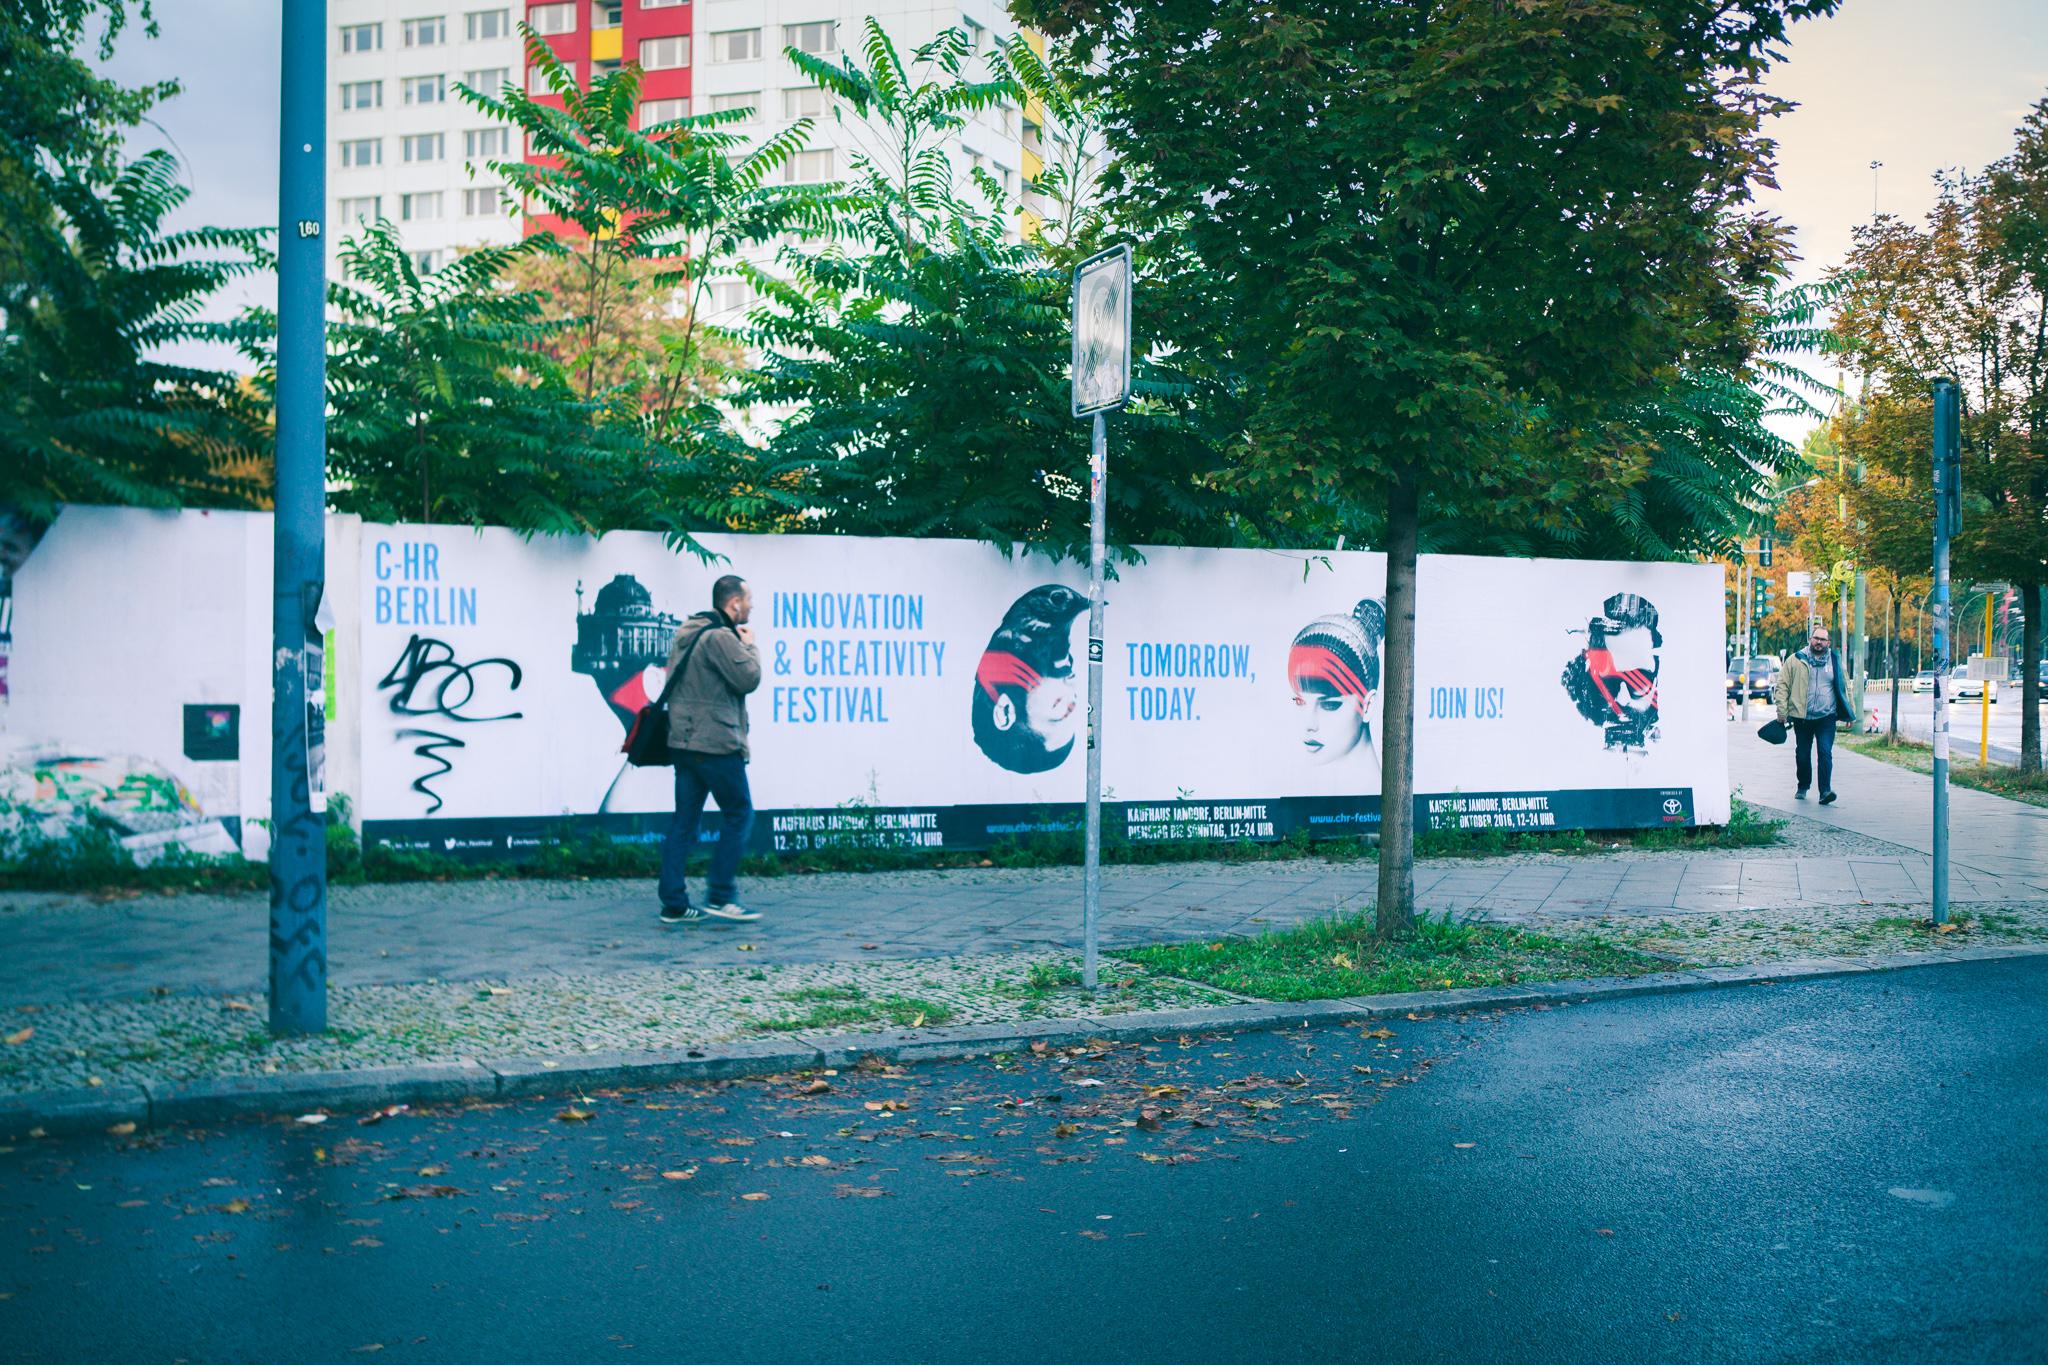 C-HR_BERLIN_Festival-0102.jpg